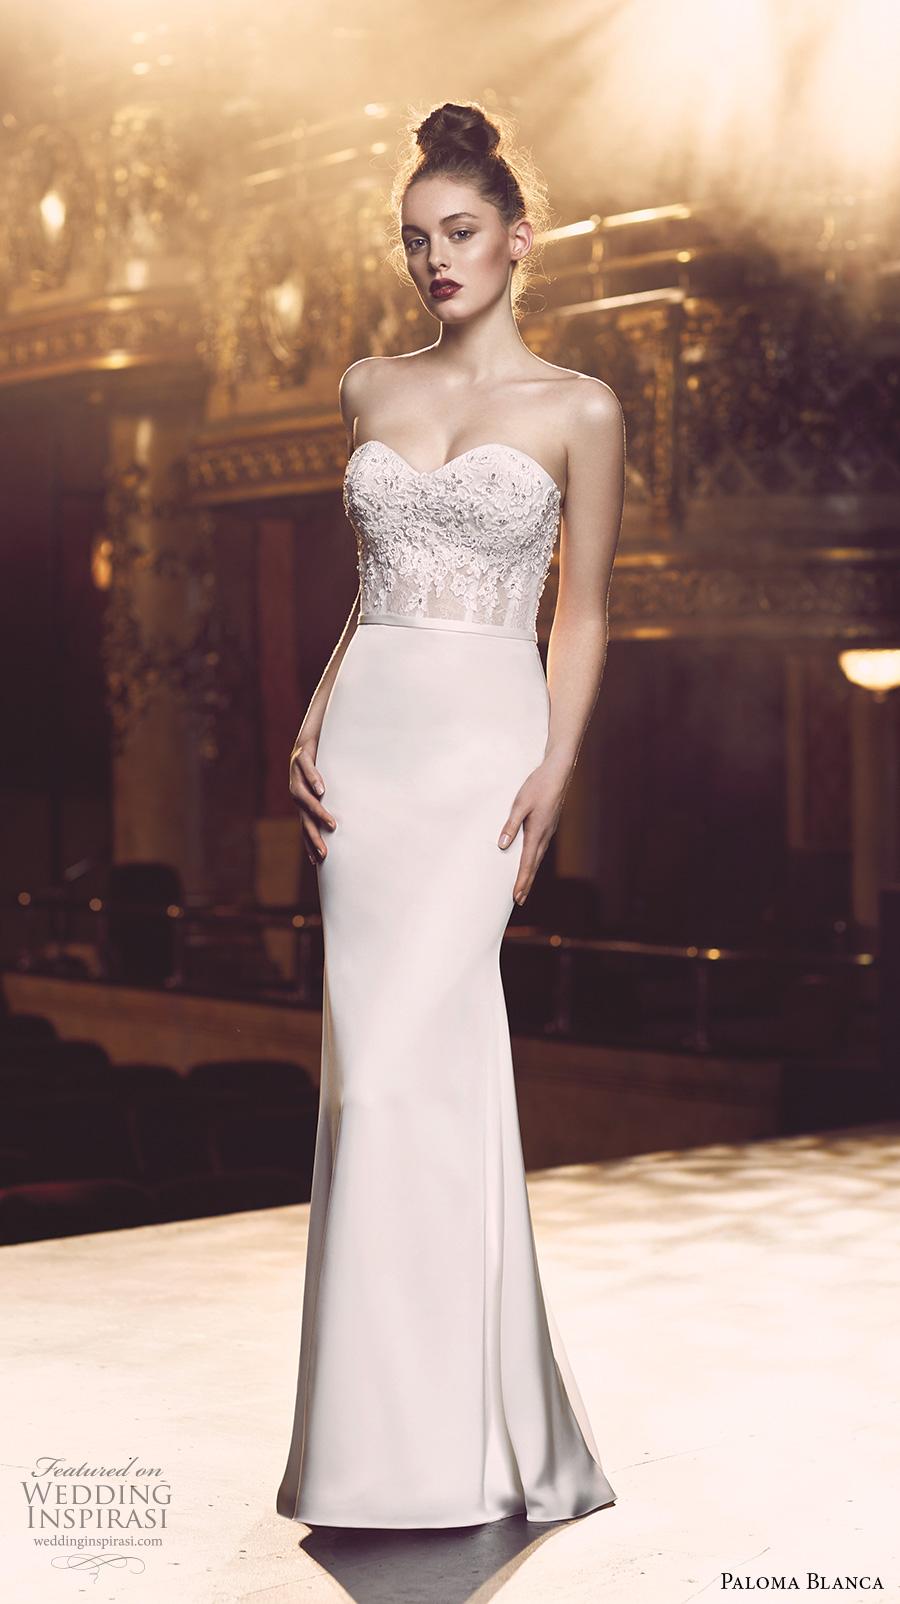 Paloma blanca fall 2016 wedding dresses wedding inspirasi for Sexy sheath wedding dress